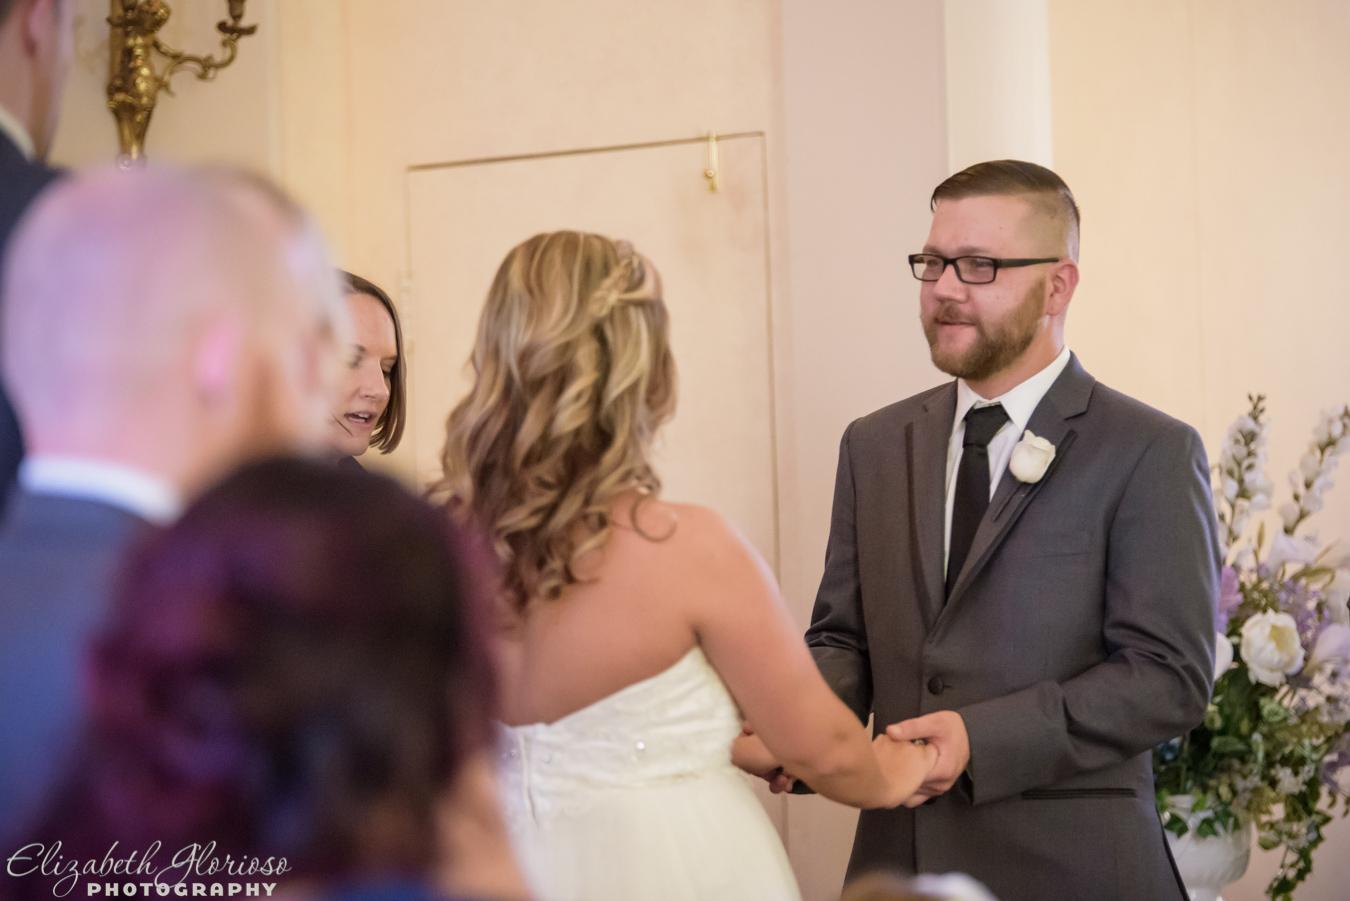 Zakovec_Wedding_Glorioso_Photography_Cleveland-121